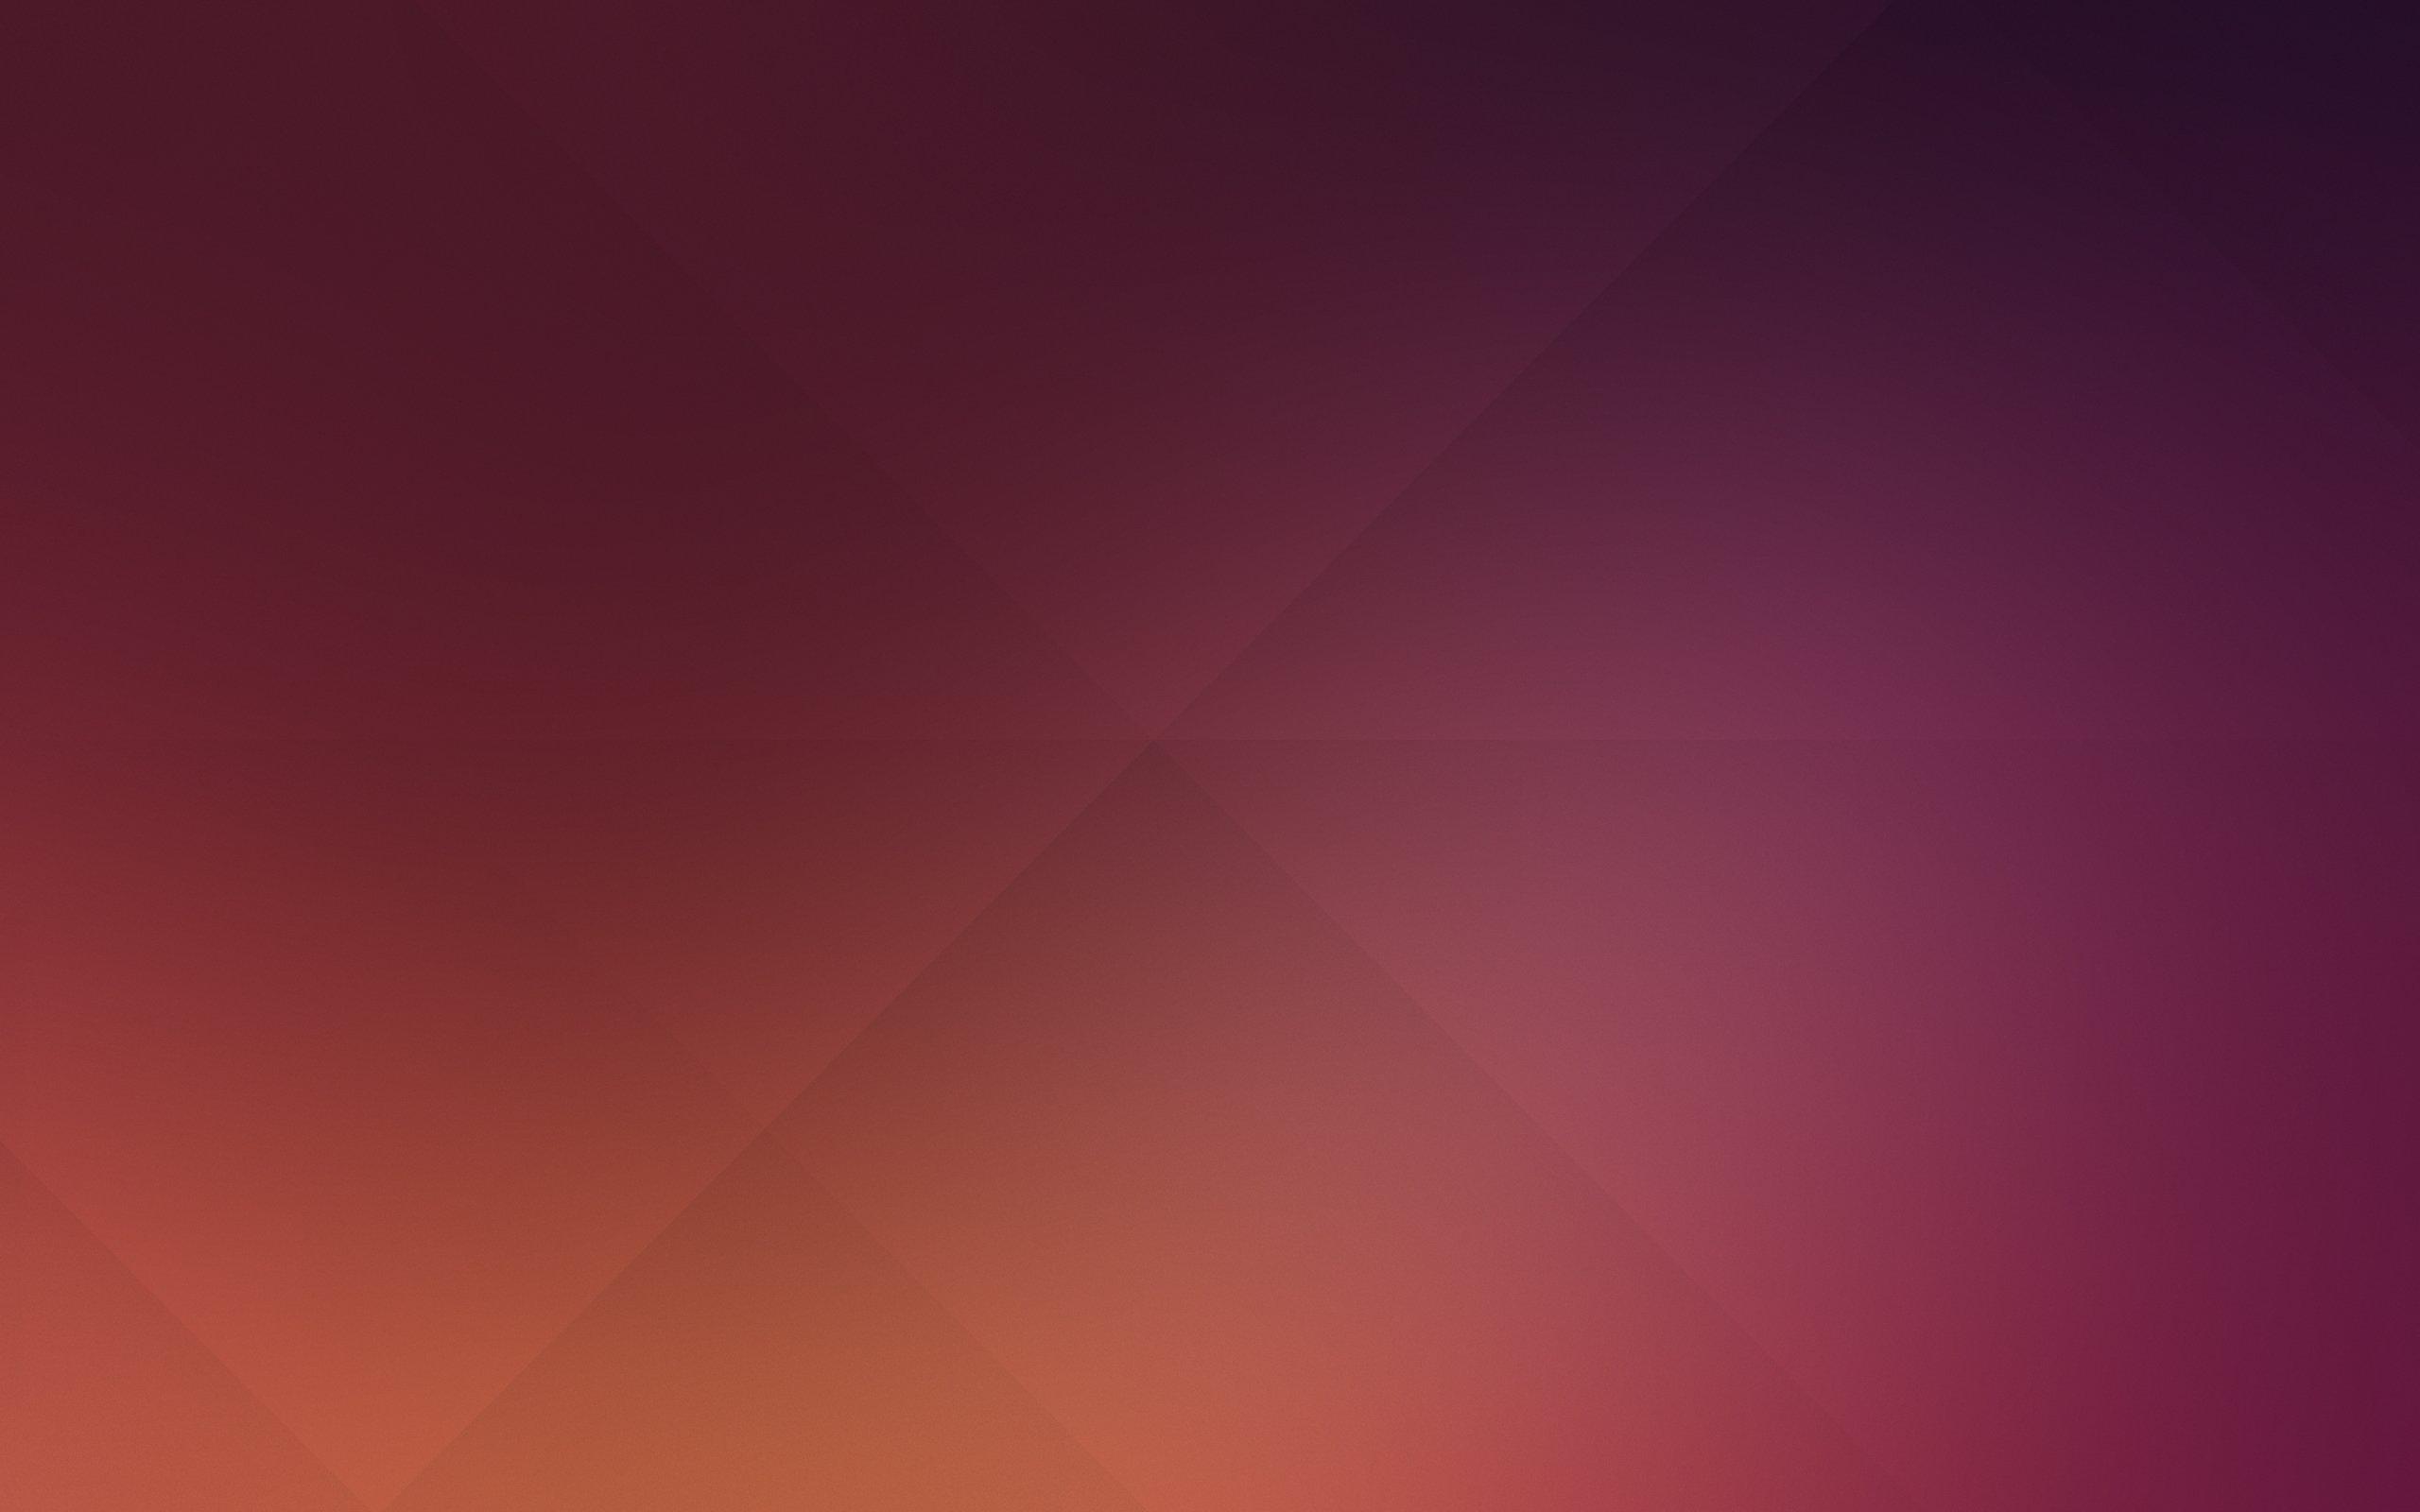 1404 default wallpaper -#main